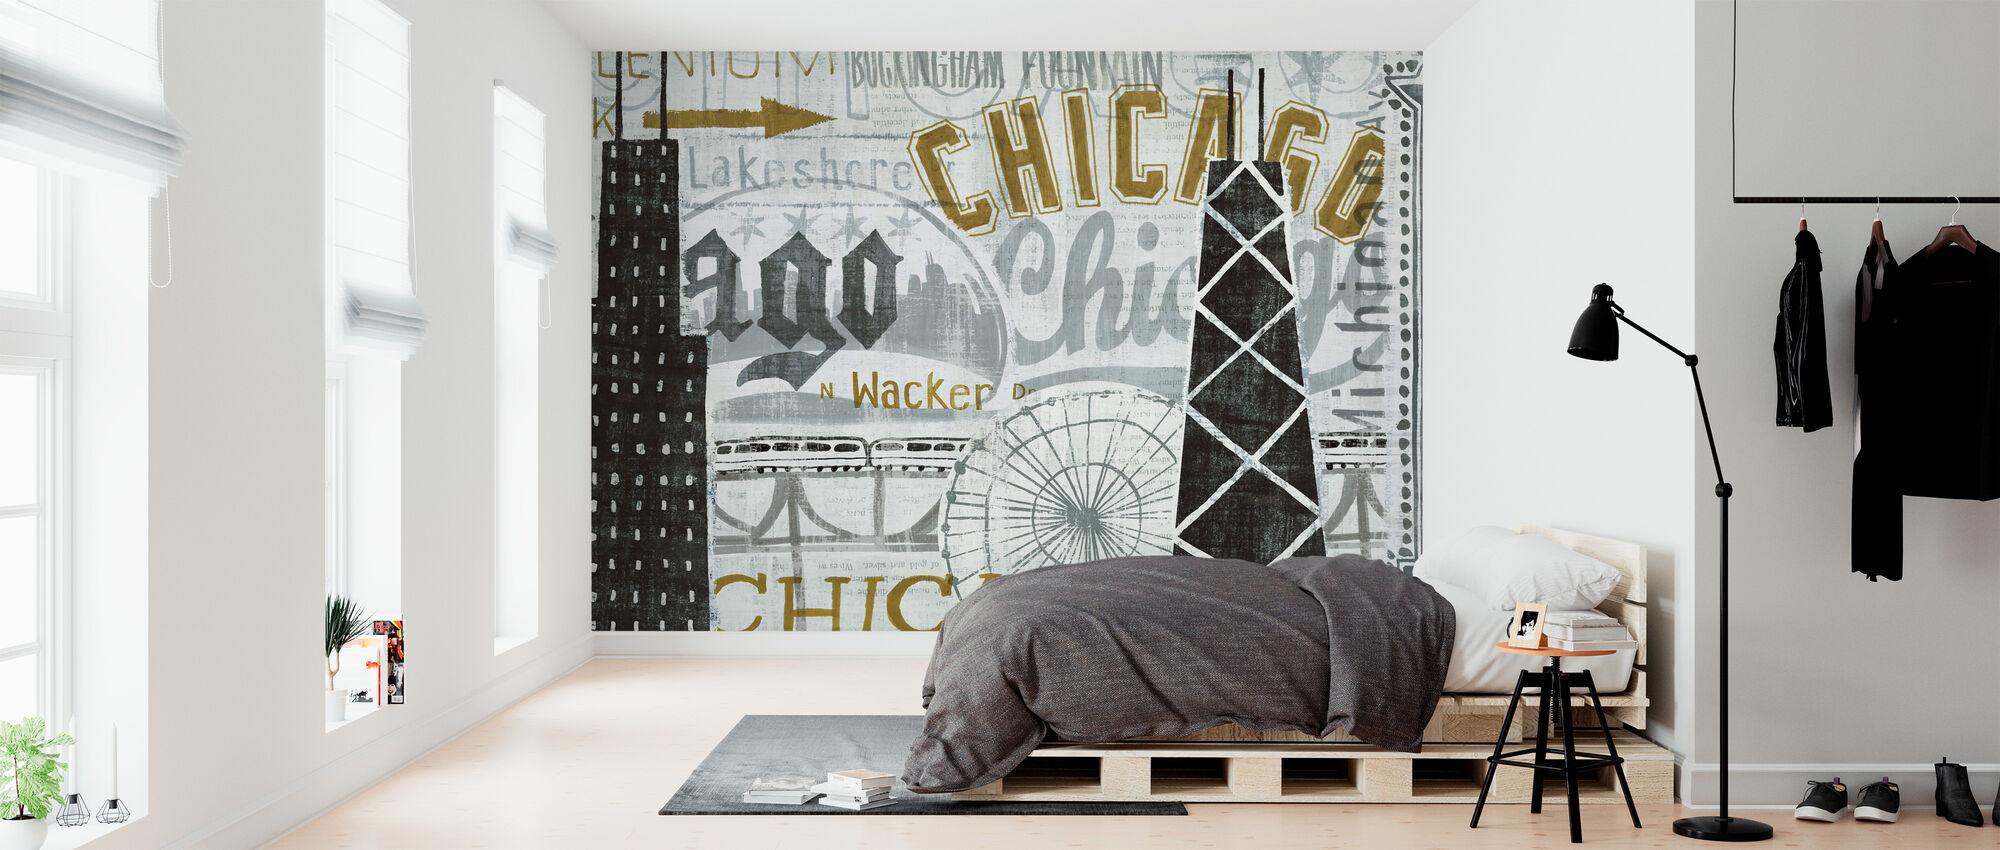 Hey Chicago Vintage - Papier peint - Chambre